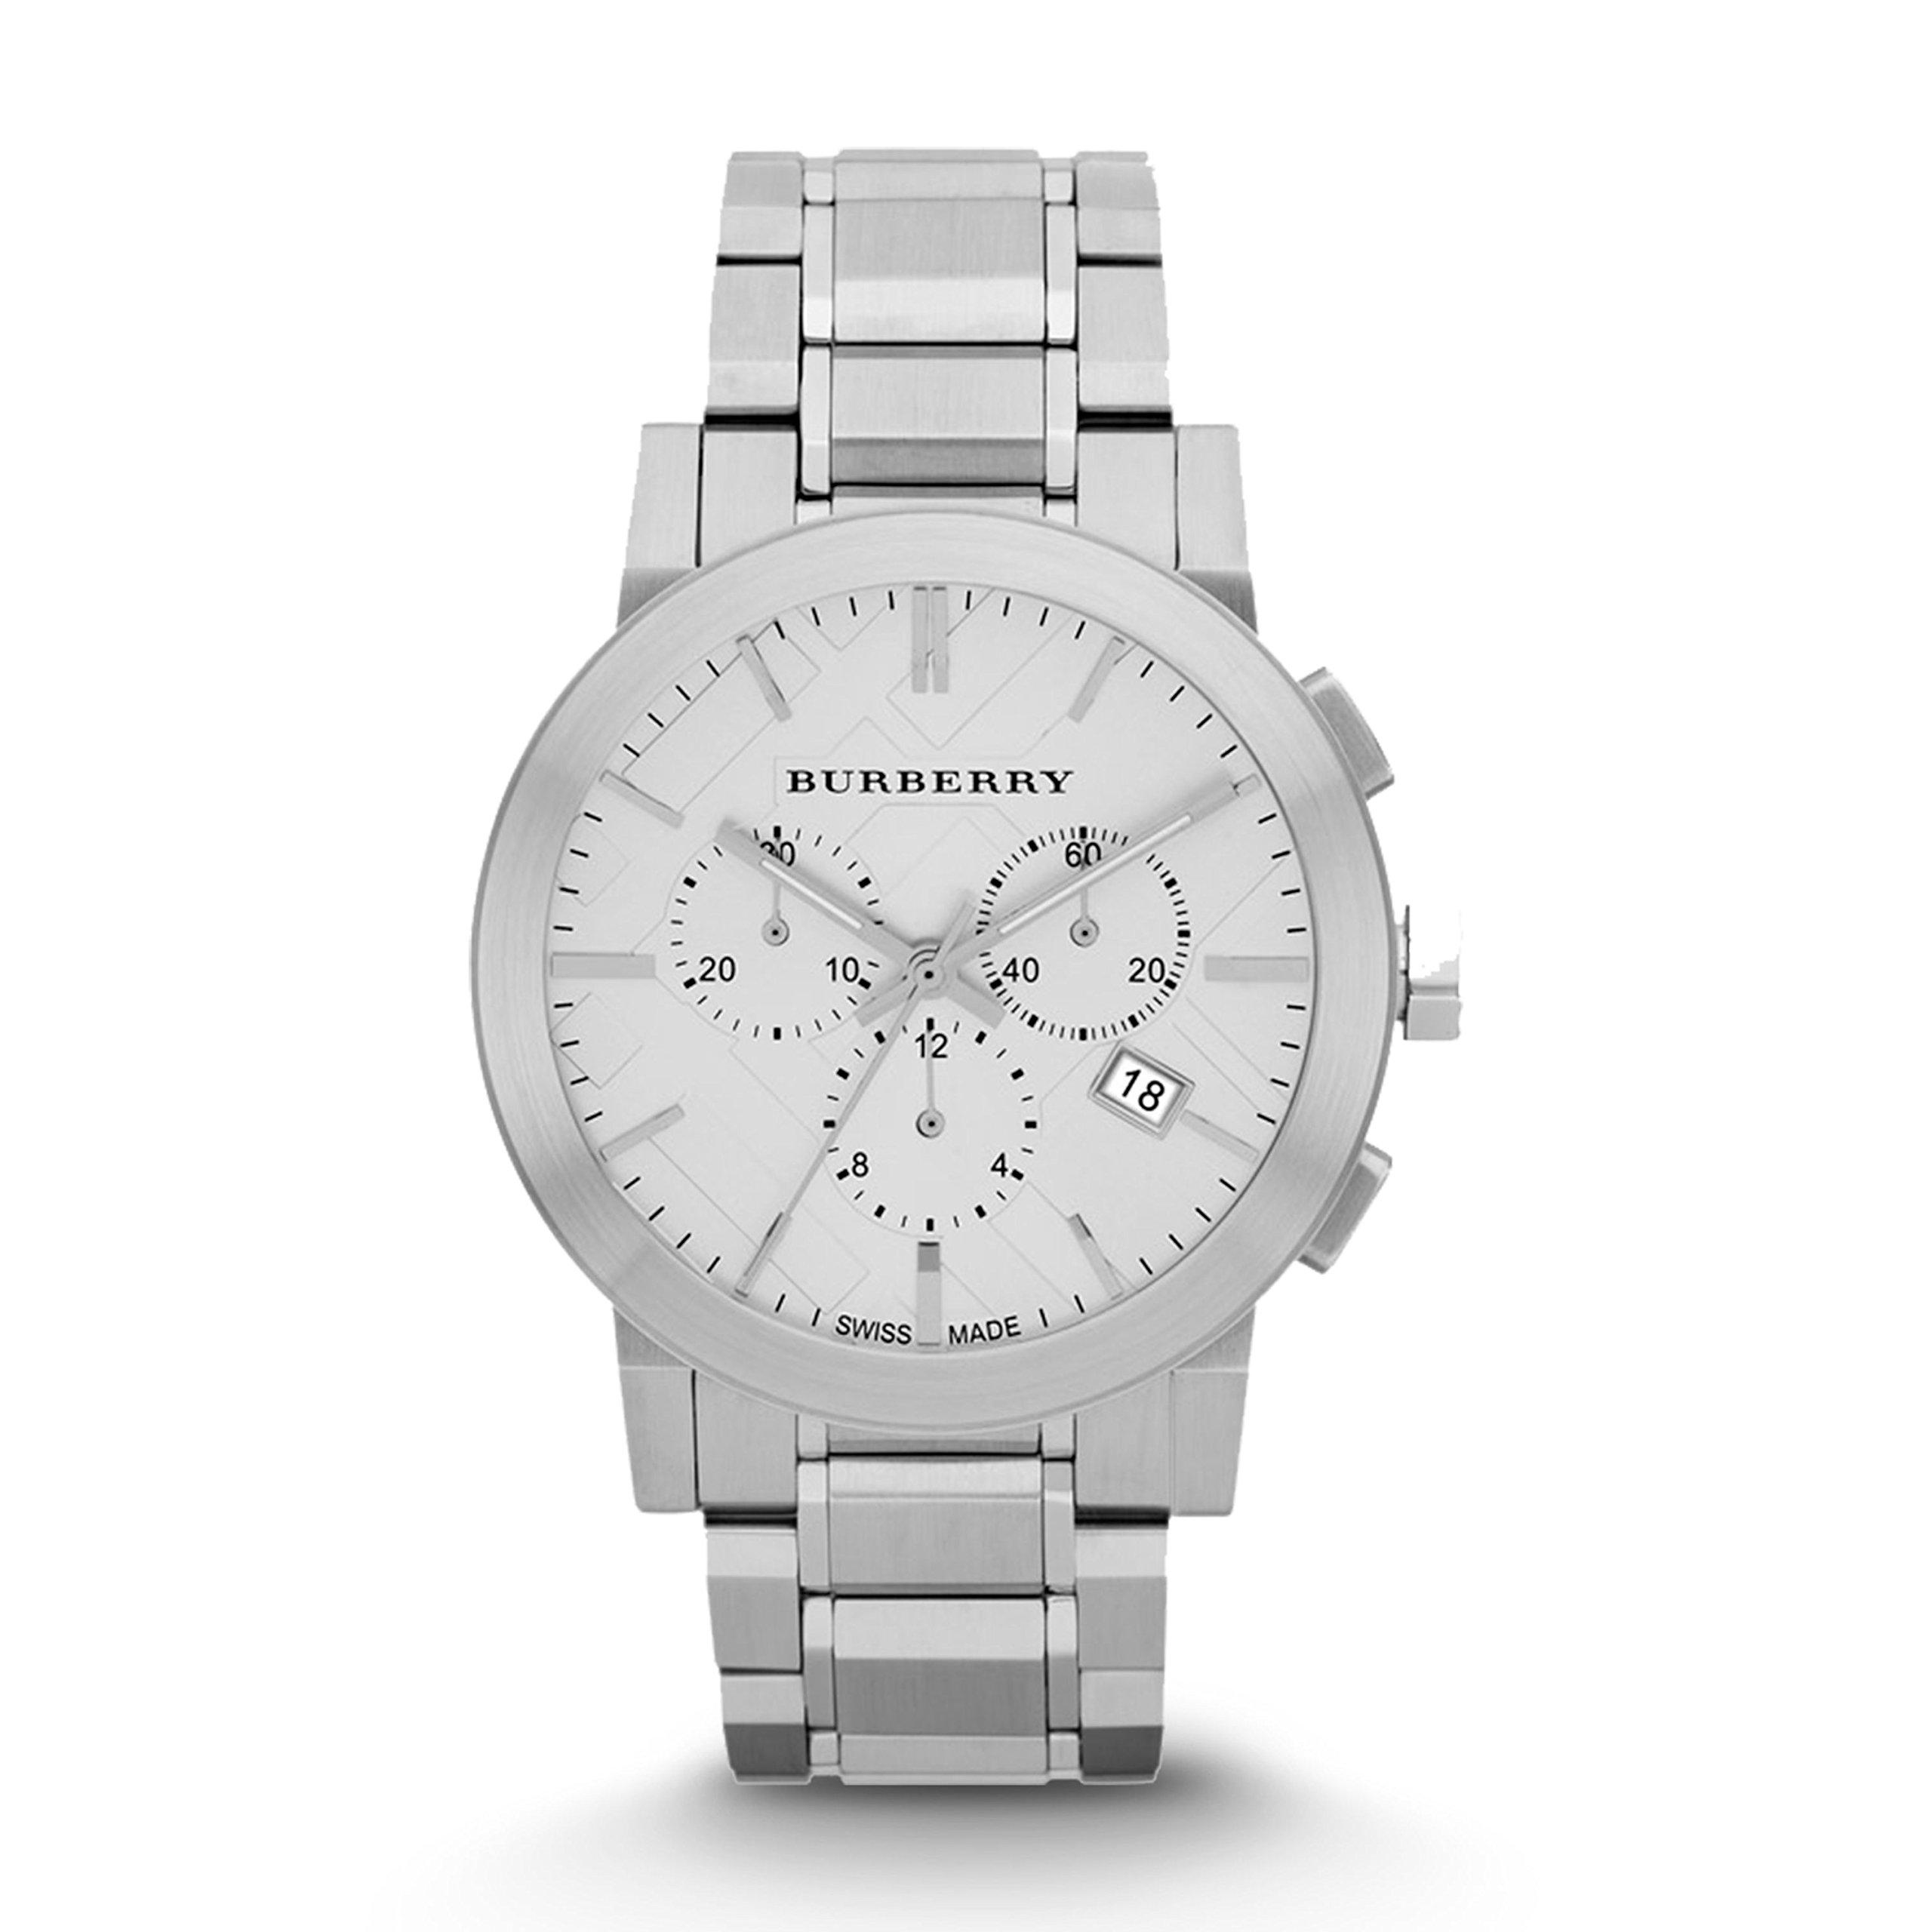 Burberry Watch, Men's Swiss Chronograph Stainless Steel Bracelet 42mm BU9350 by BURBERRY